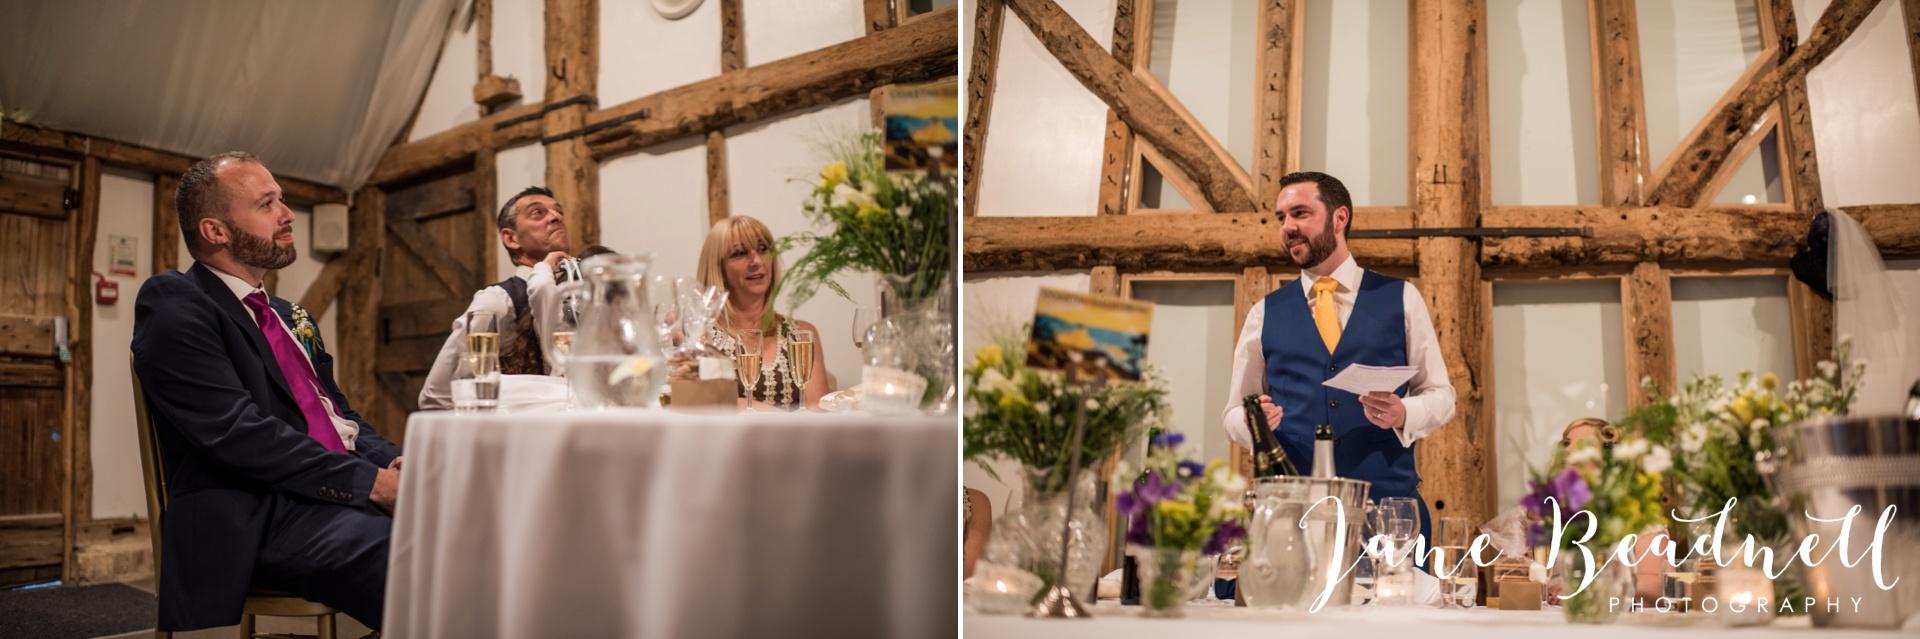 South Farm Wedding photography Hertfordshire by Jane Beadnell Photography fine art wedding photographer_0201